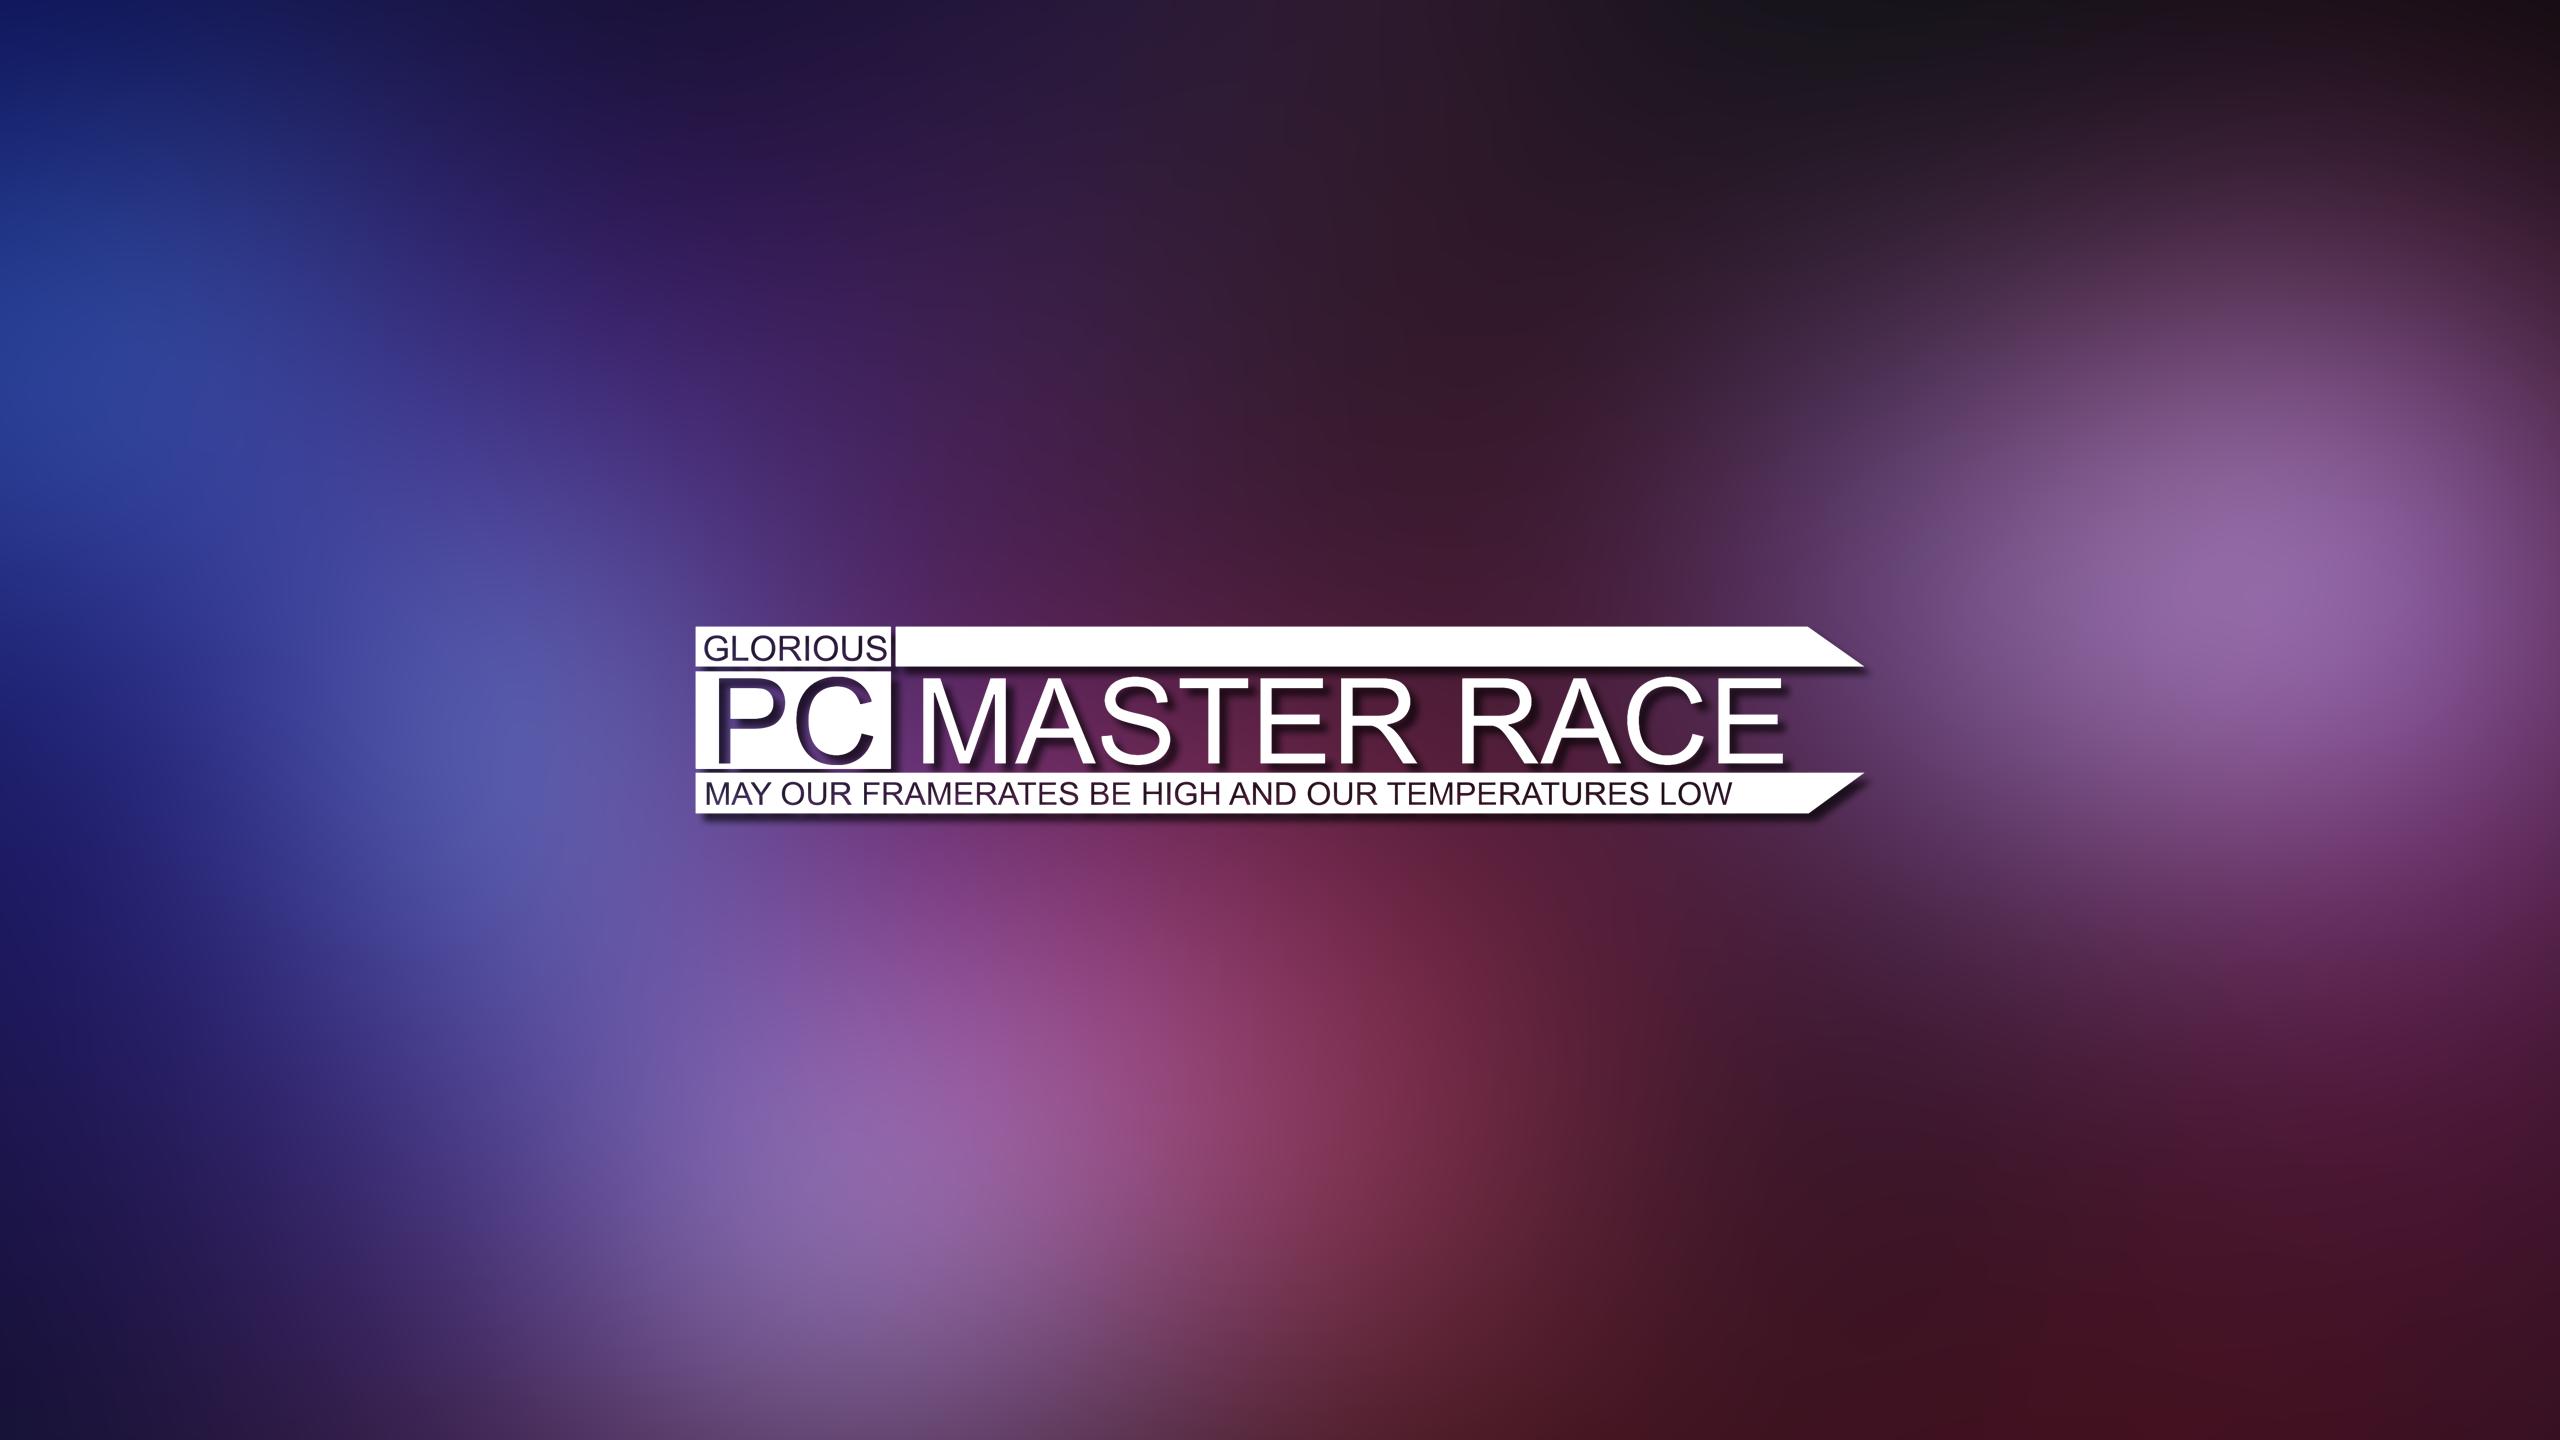 83 Pc Master Race Wallpapers On Wallpapersafari